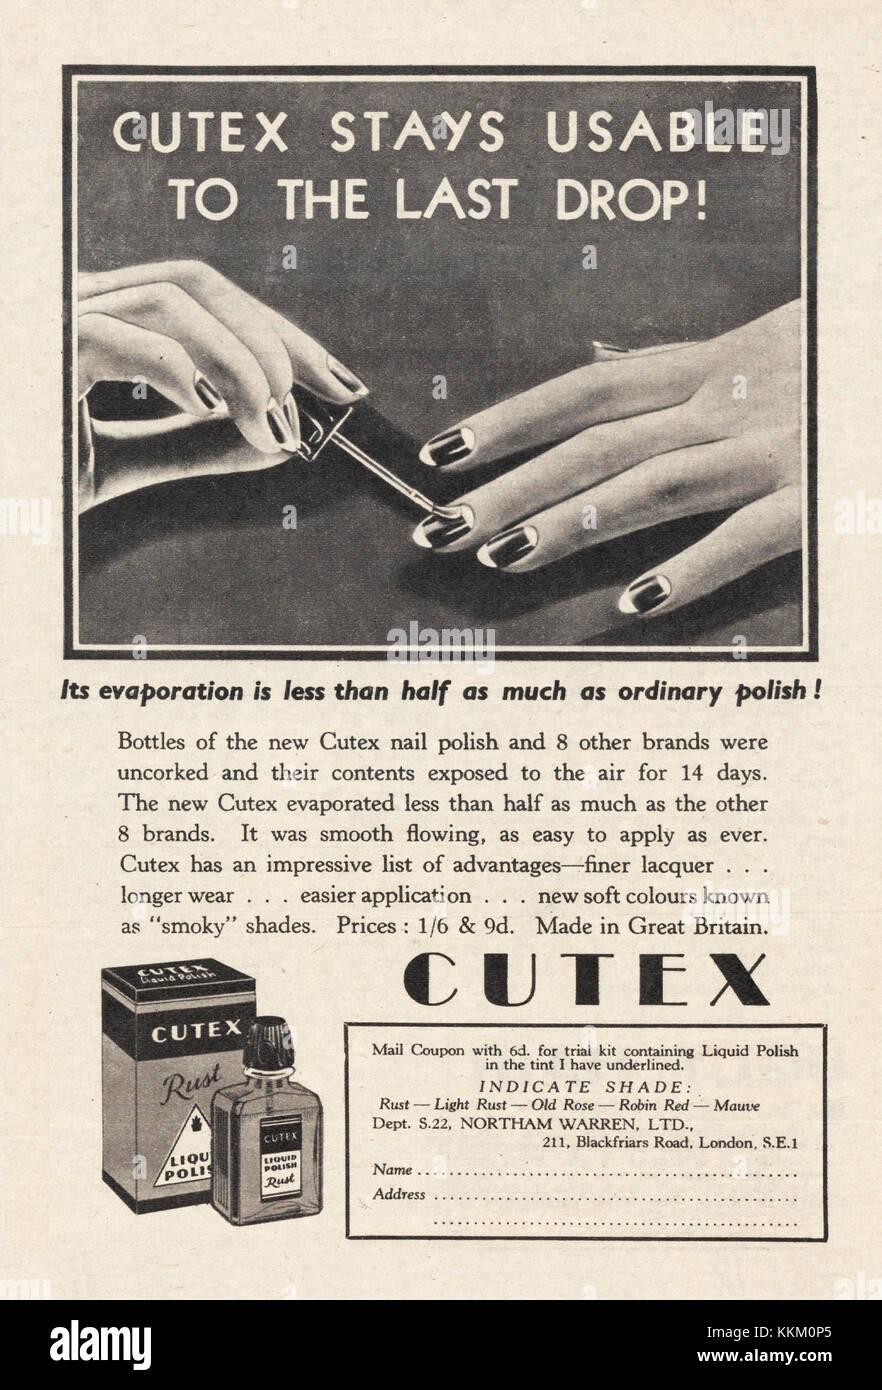 Cutex Stock Photos & Cutex Stock Images - Alamy